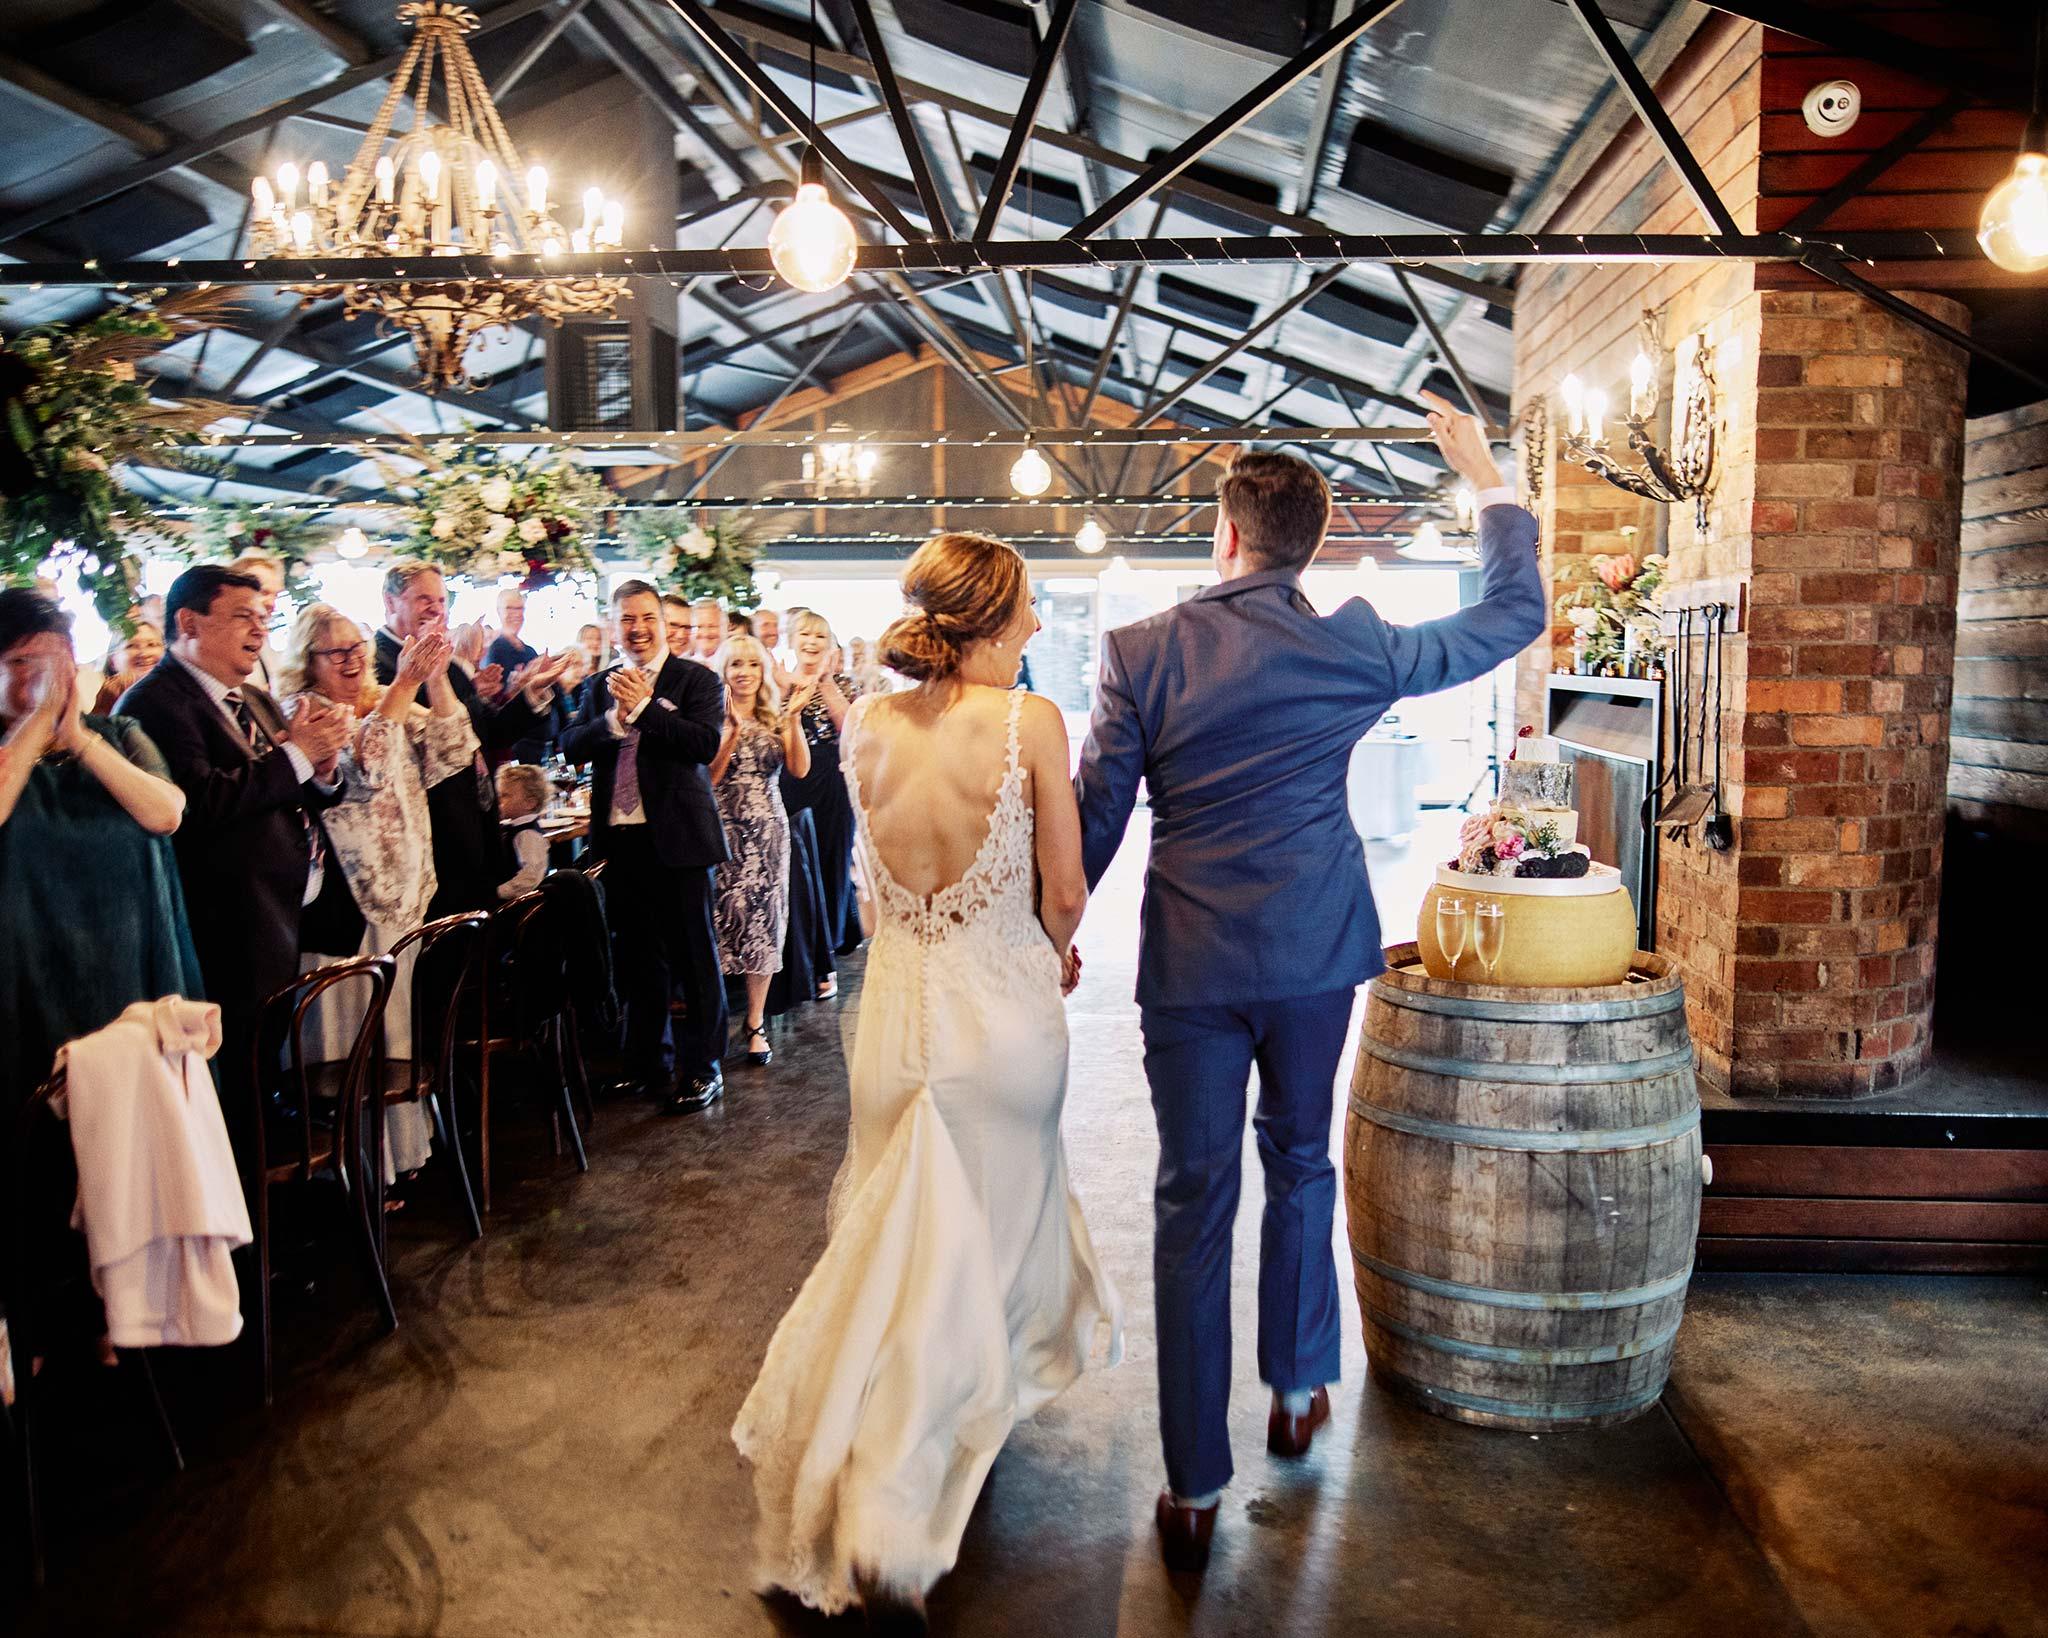 Zonzo estate wedding bridal entry reception